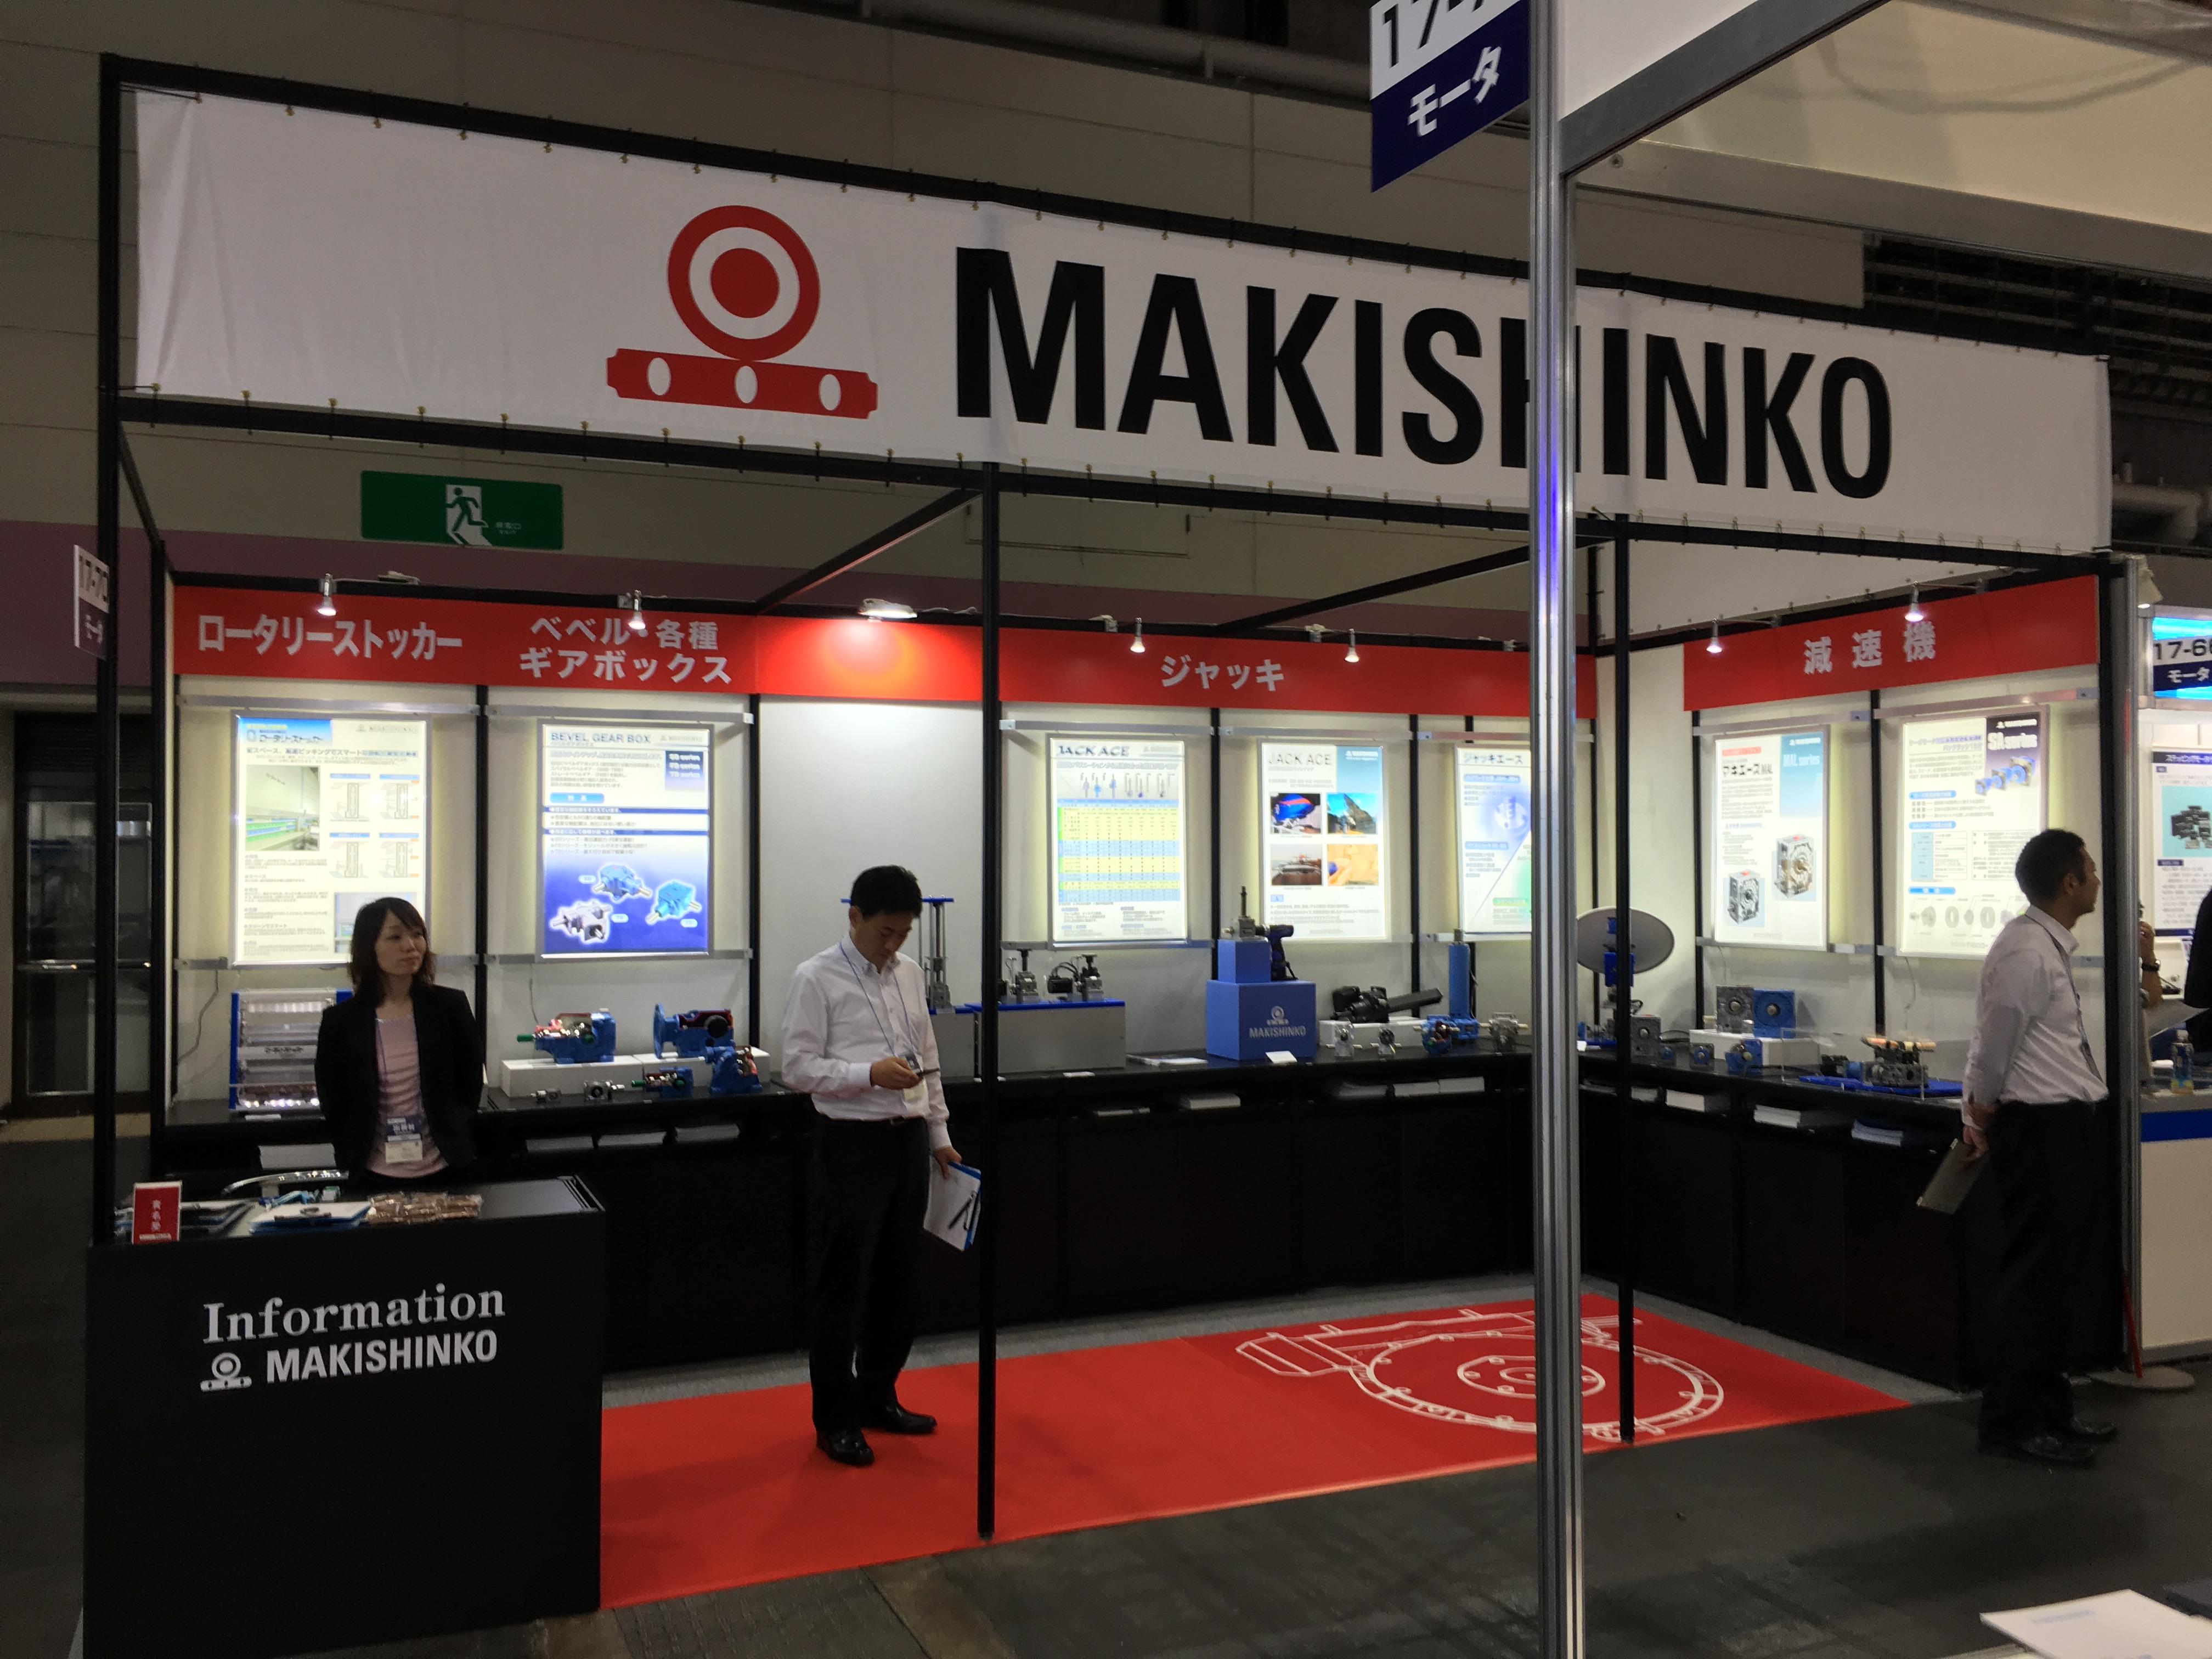 http://www.makishinko.co.jp/news/IMG_7647.JPG